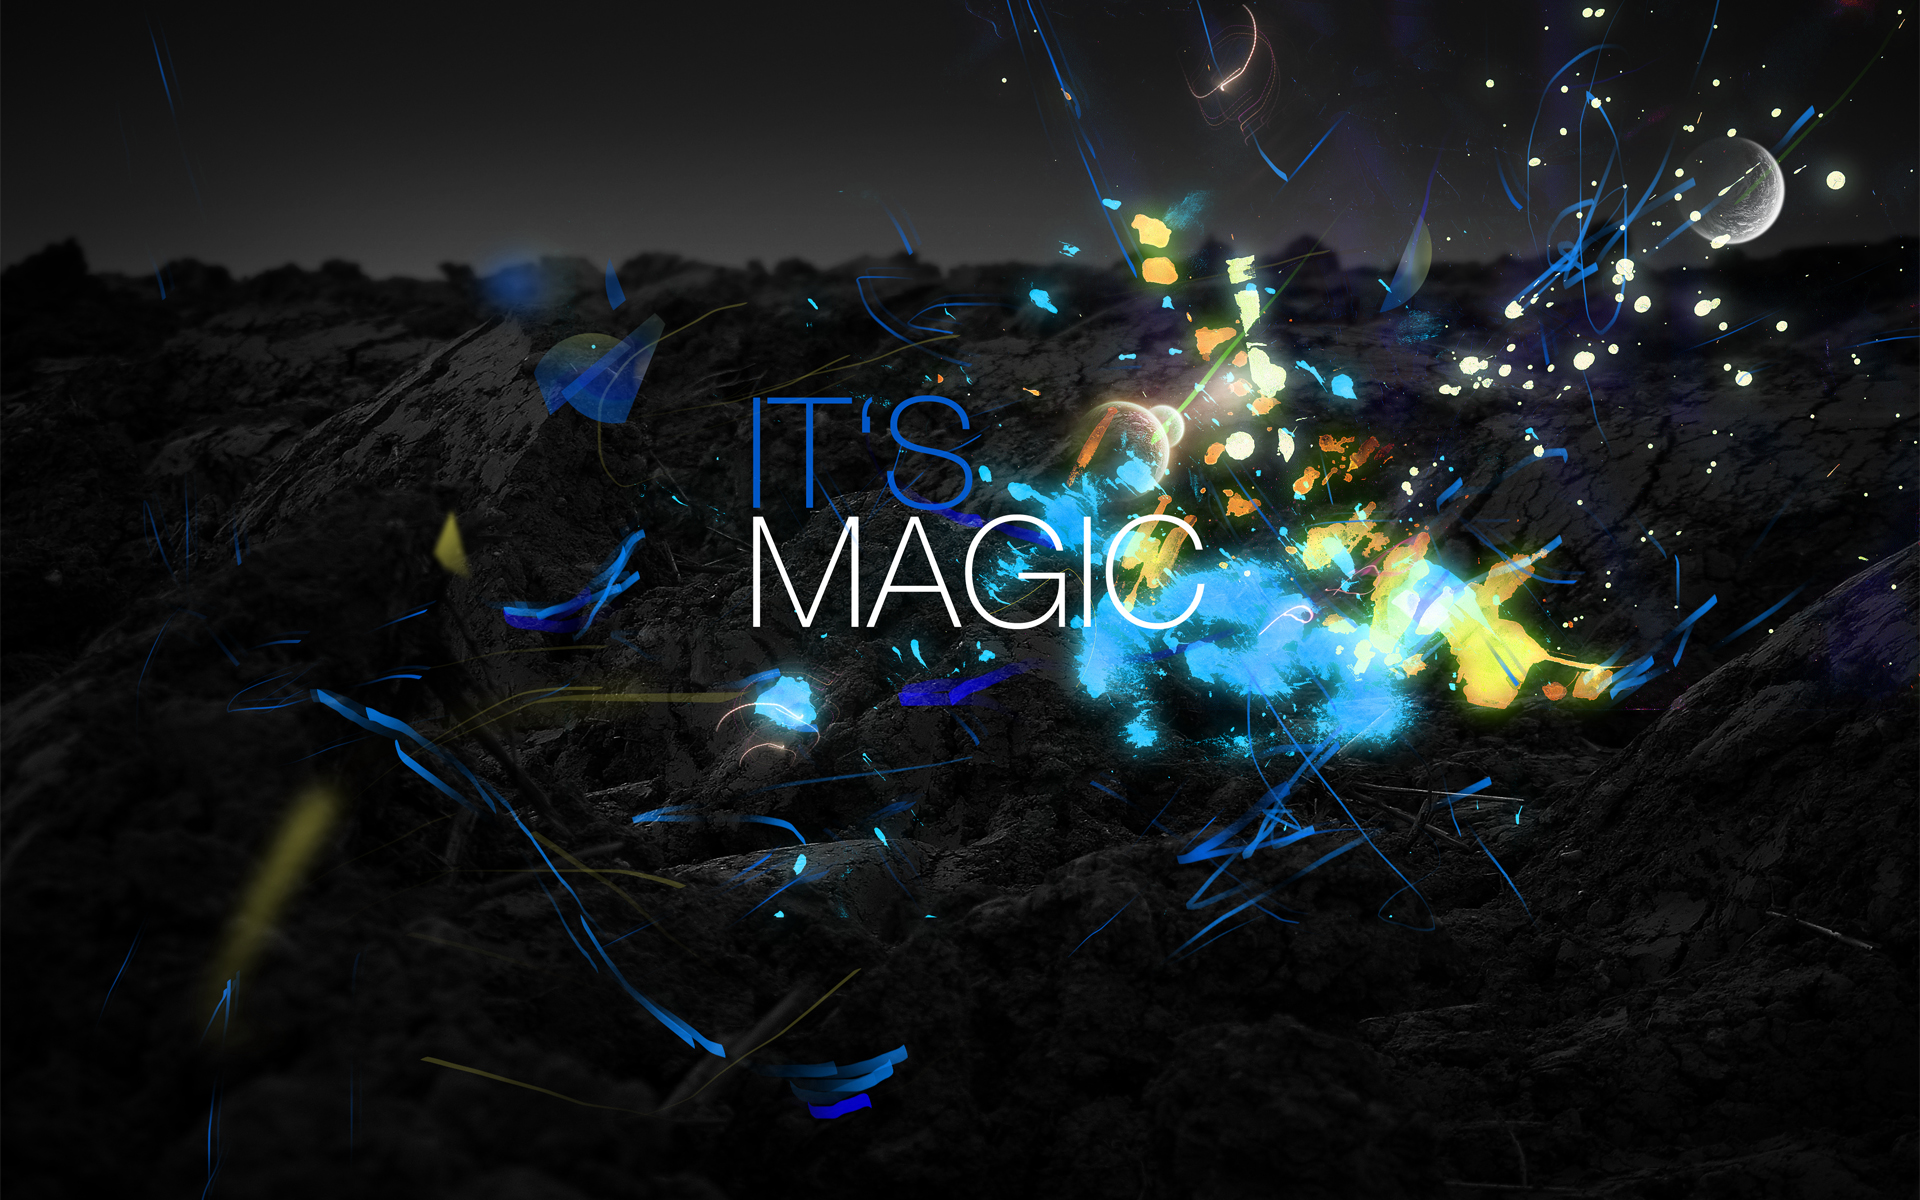 48 The Magicians Wallpaper On Wallpapersafari